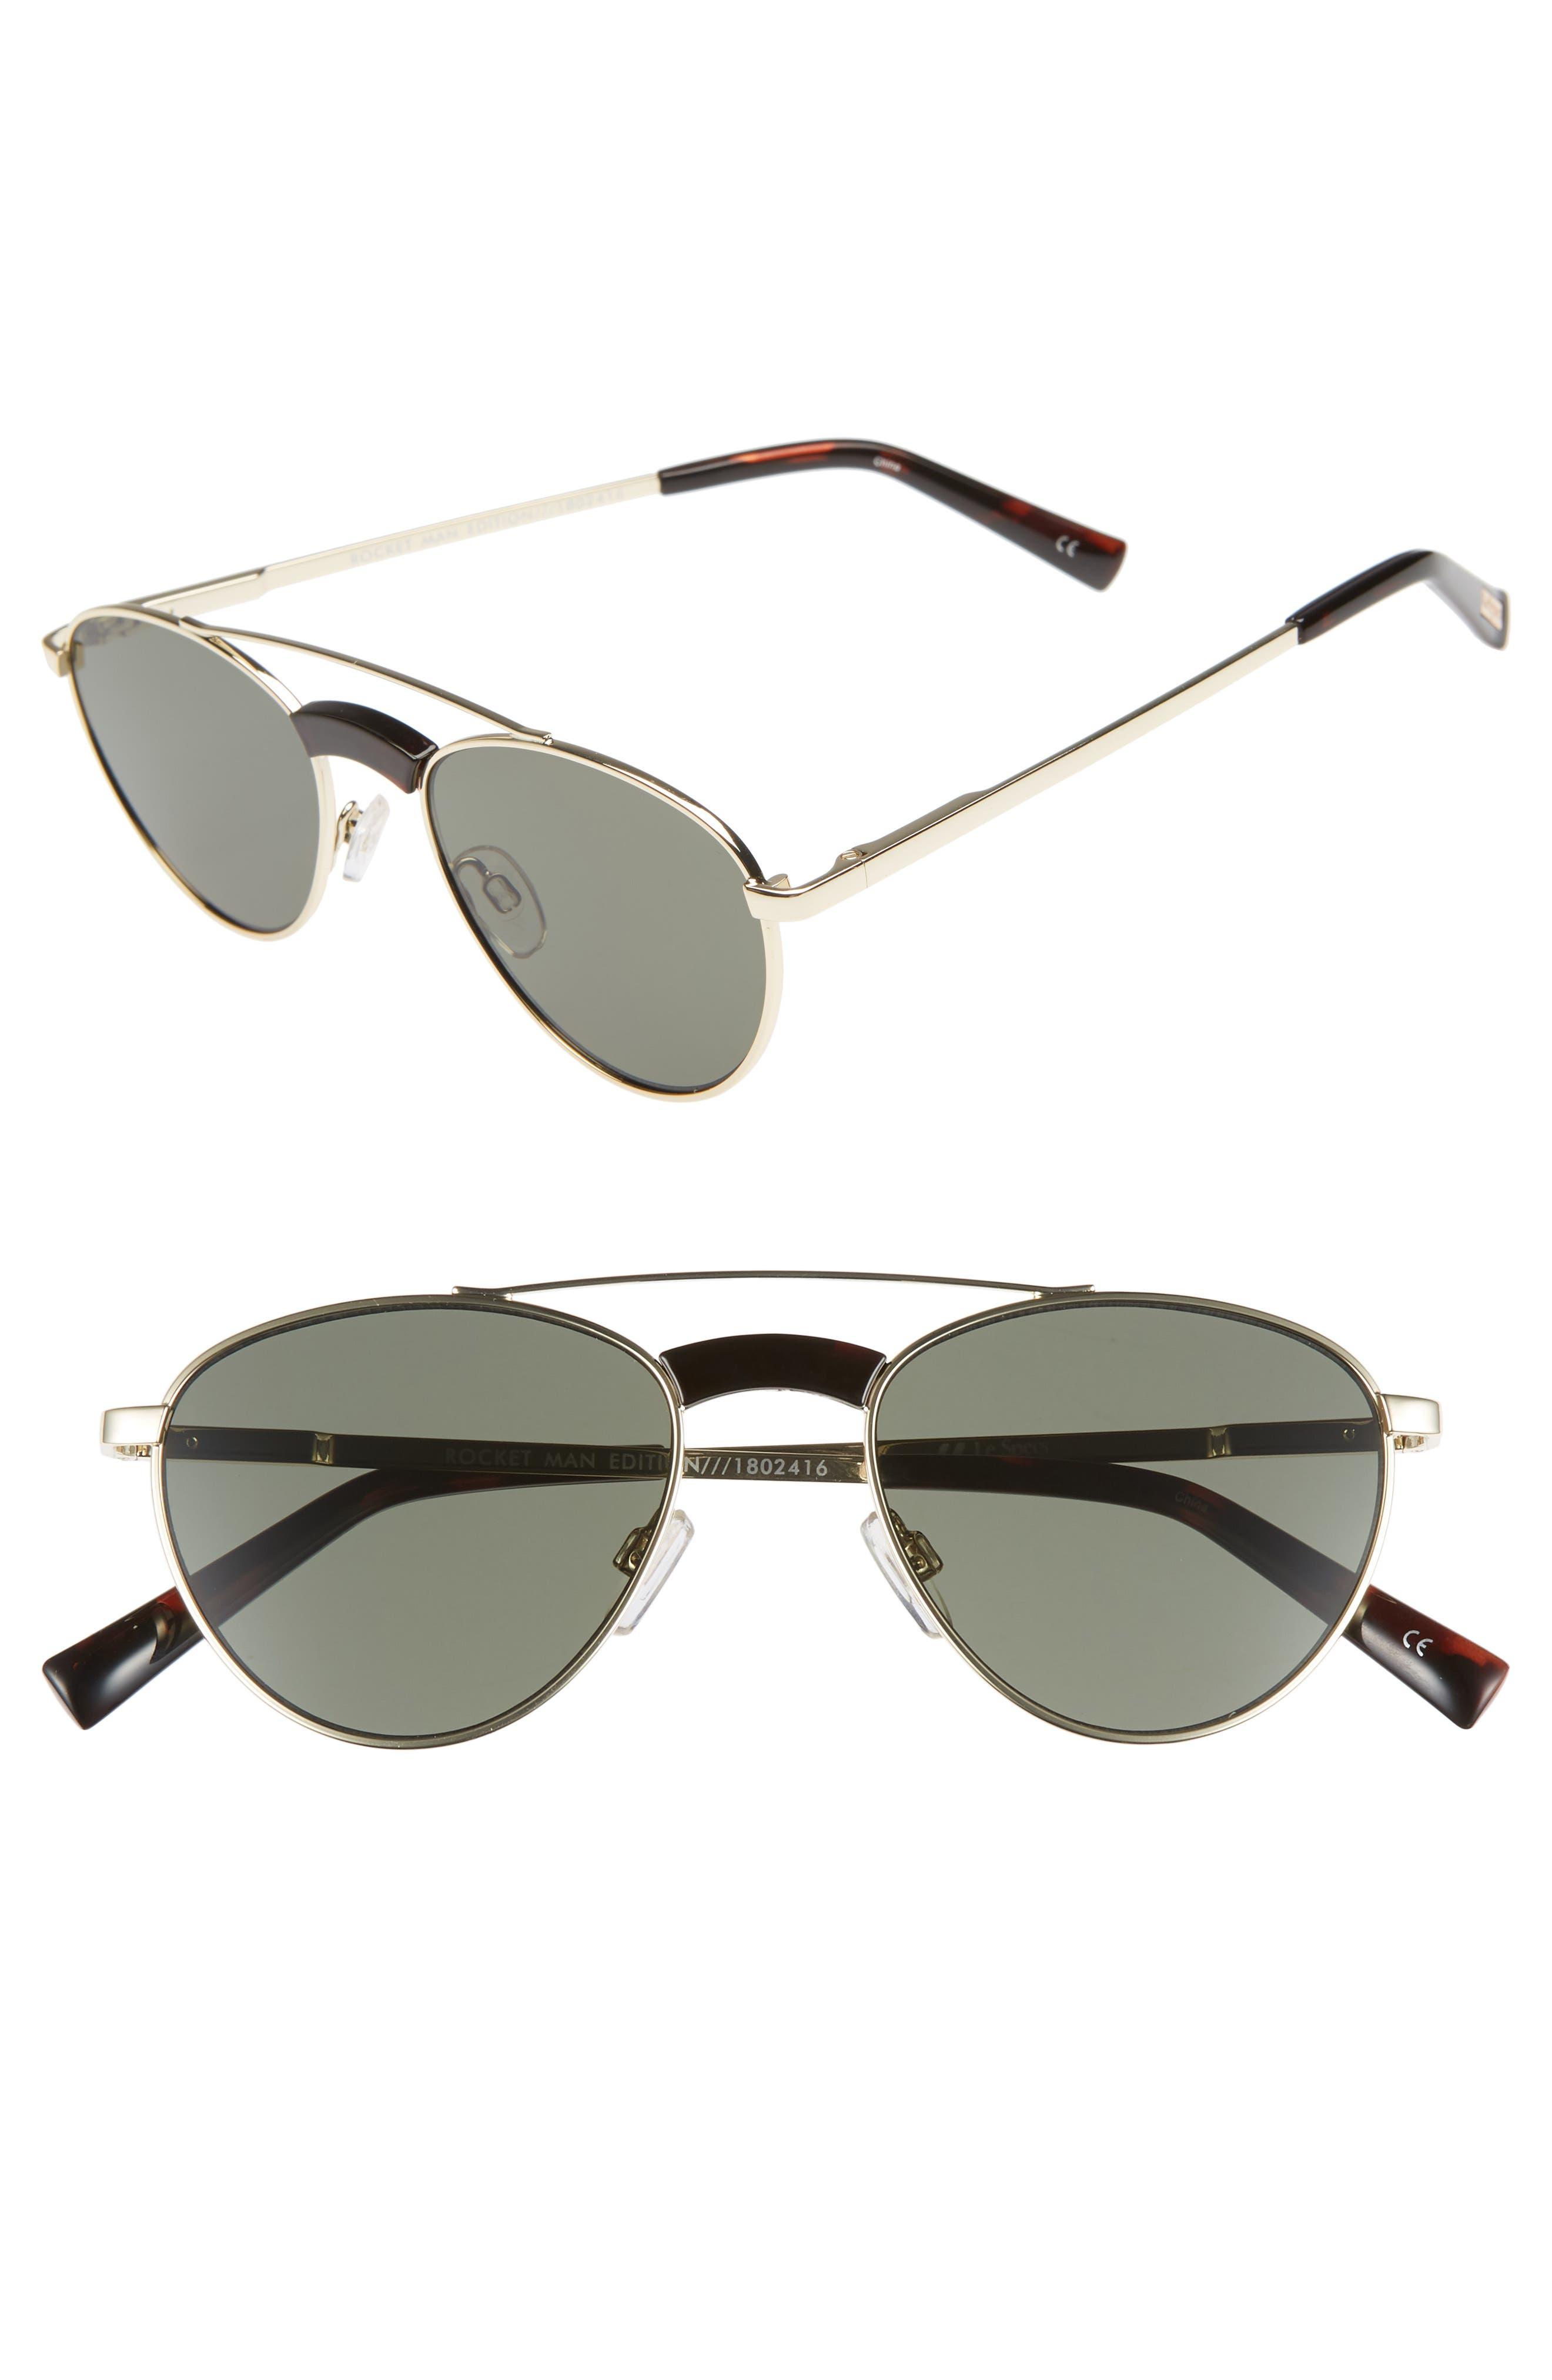 Le Specs Rocket Man 52Mm Aviator Sunglasses - Bright Gold